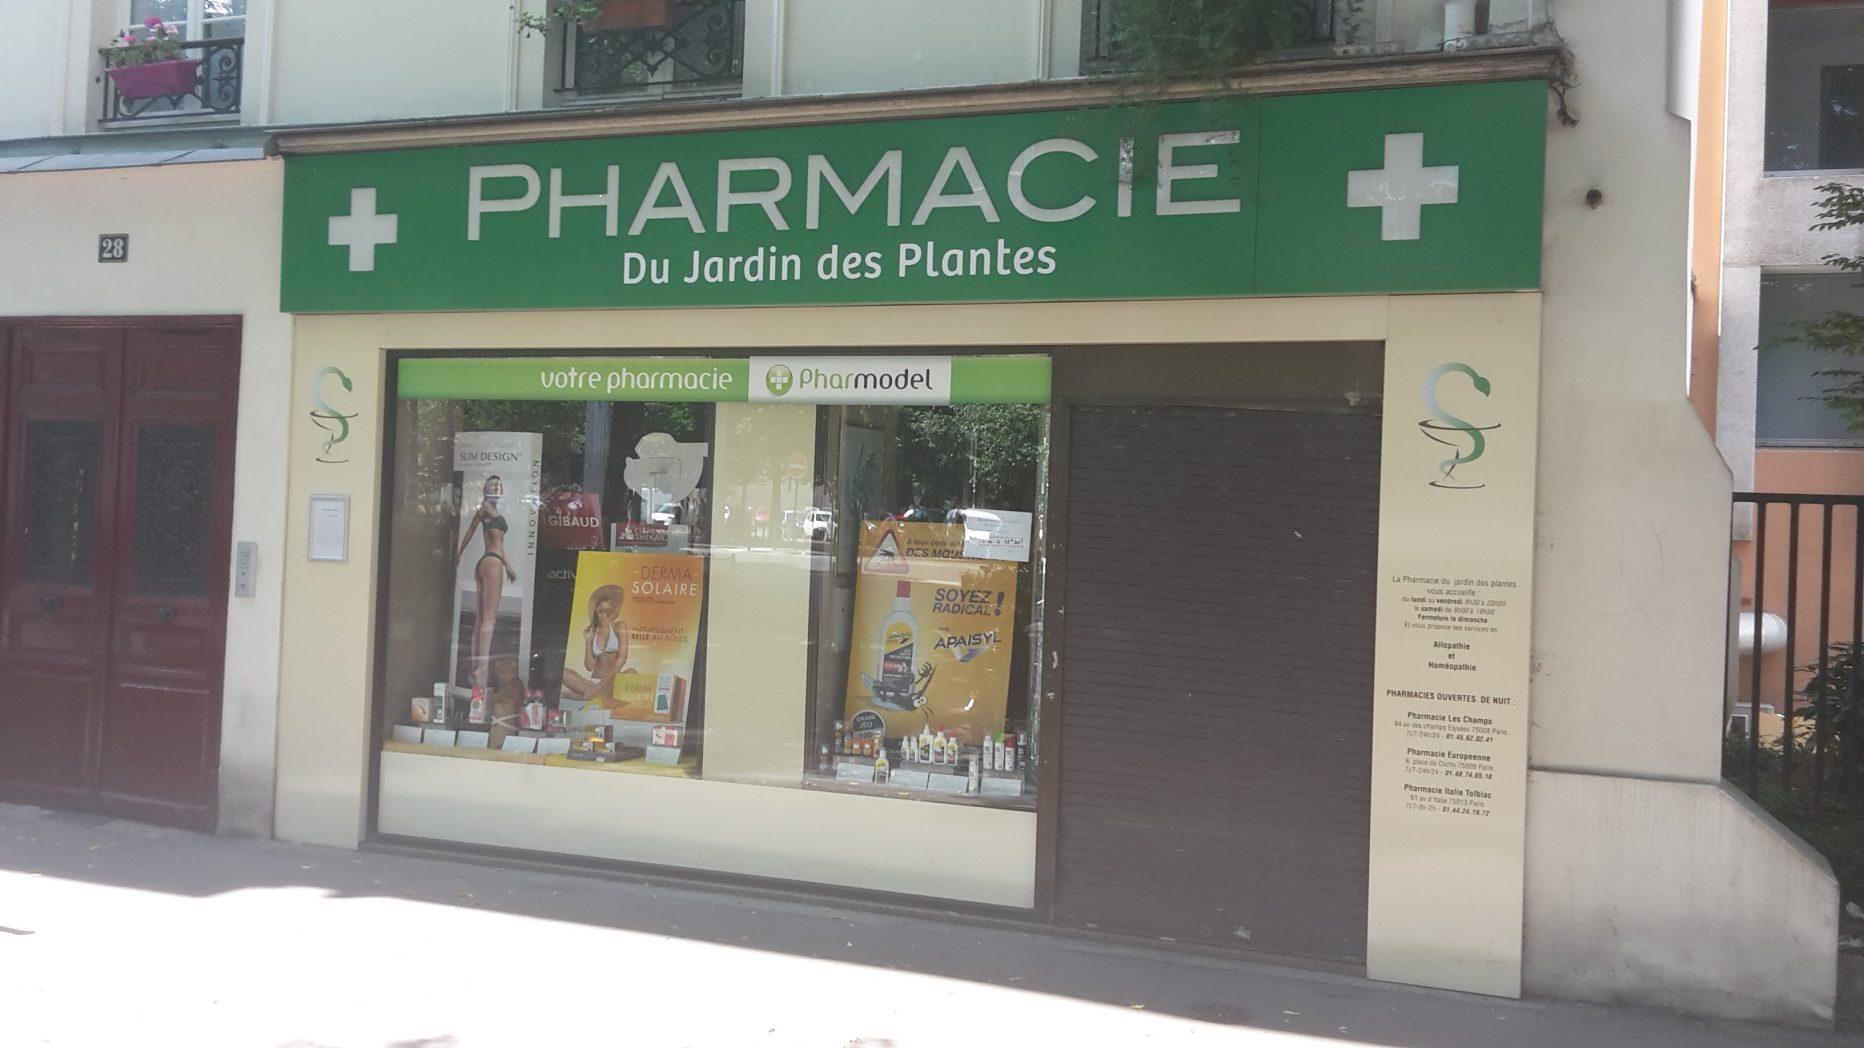 Pharmacie du Jardin des Plantes